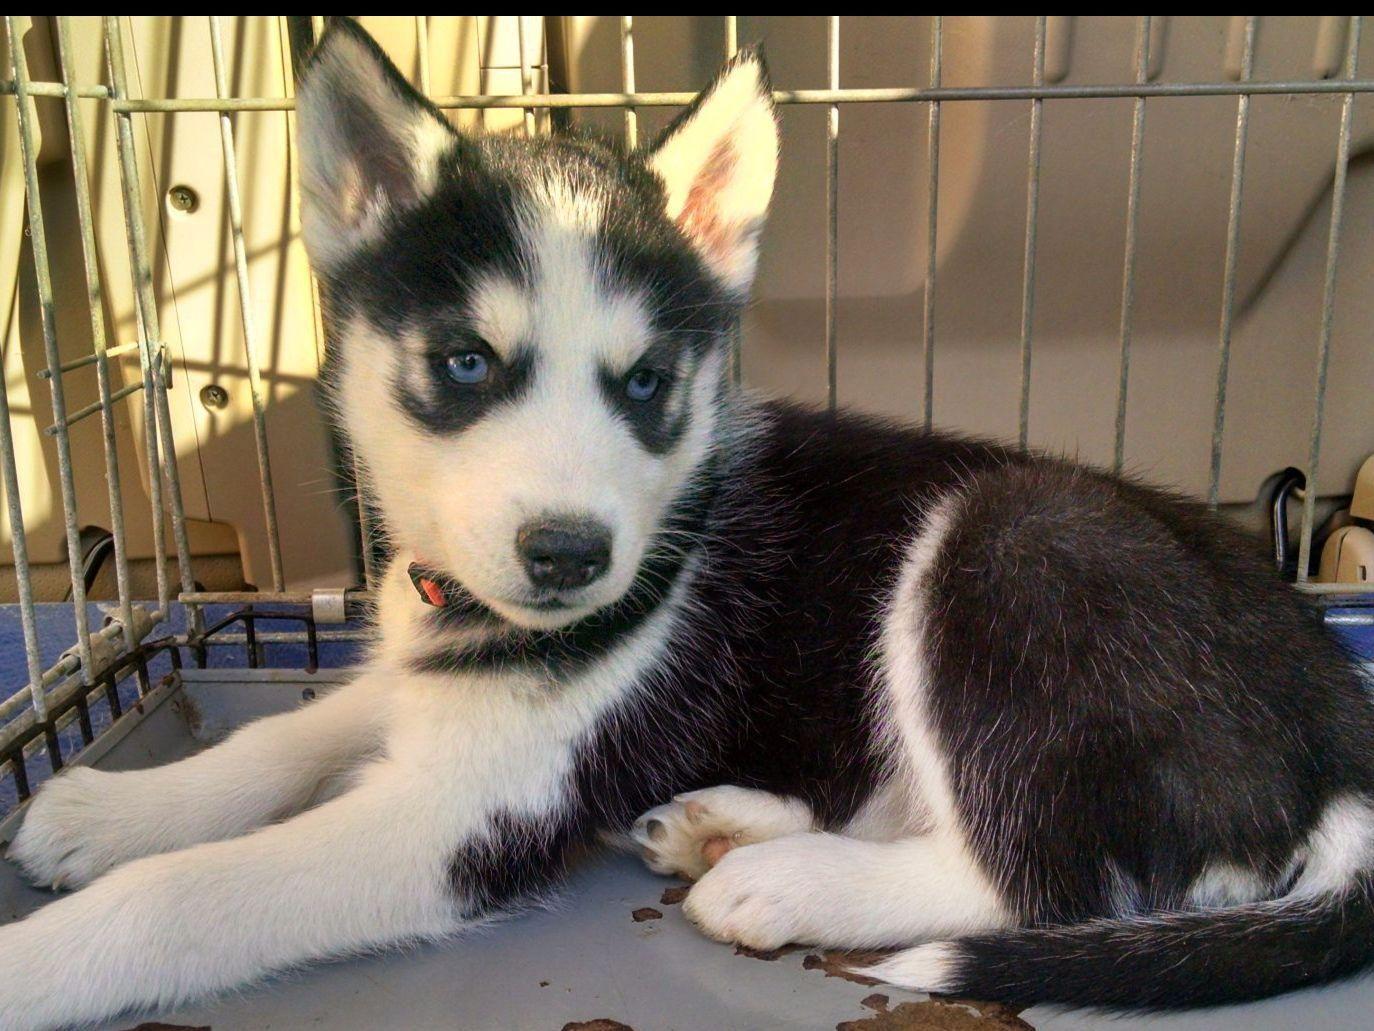 Pin by Rebecca Slevin on Pups❤ ❤ ❤ ❤ | Pinterest | Siberian Husky Puppies Boston Ma